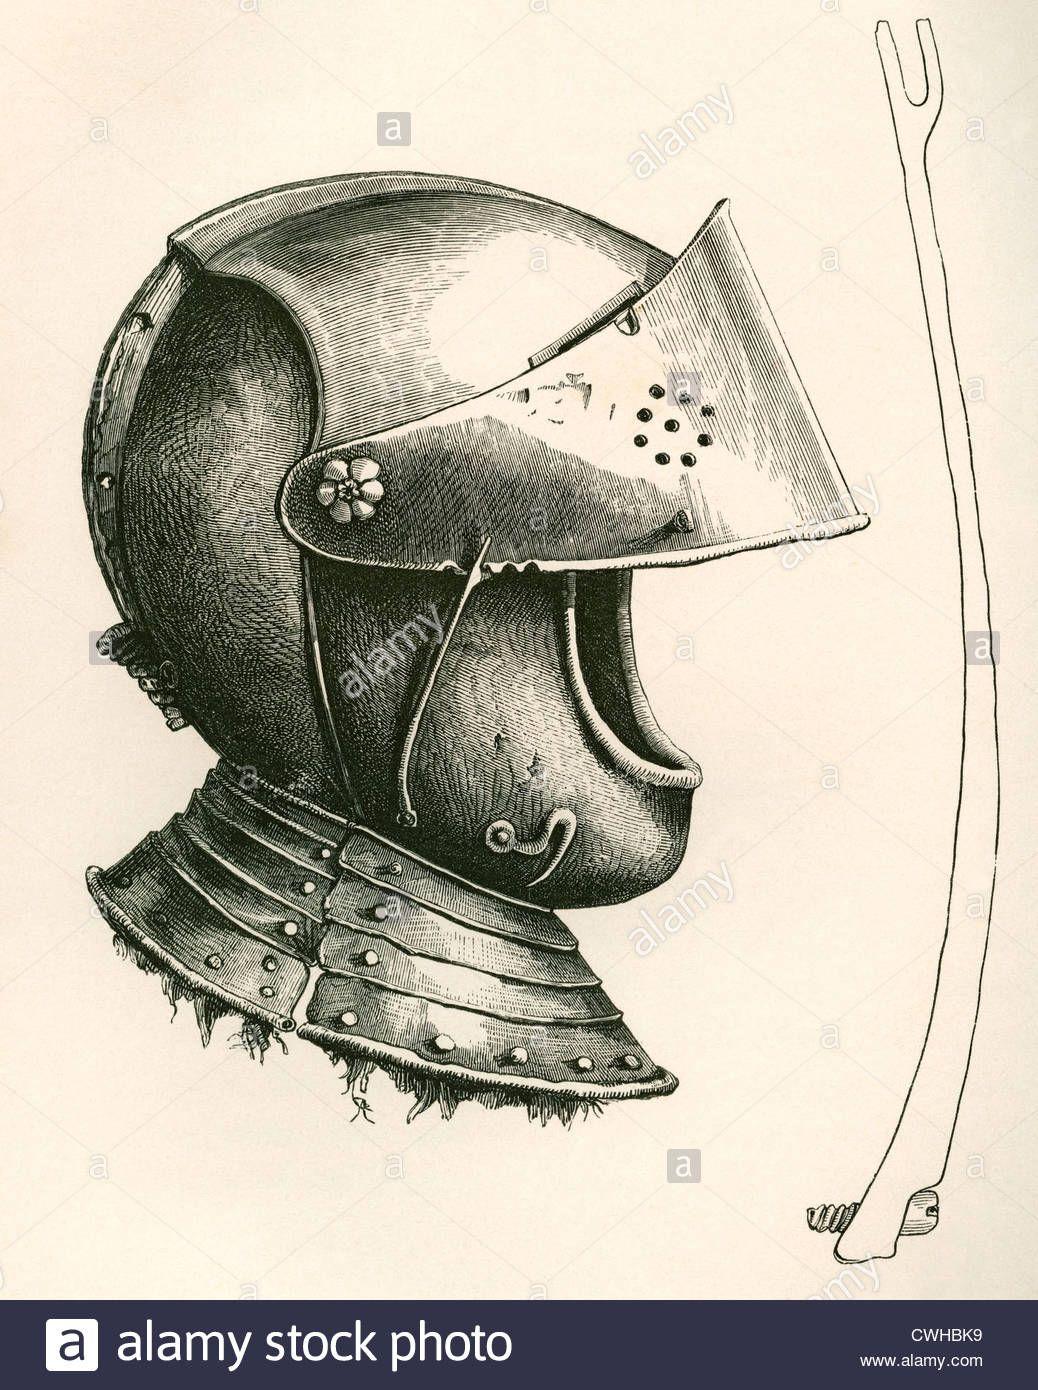 Dating military helmets